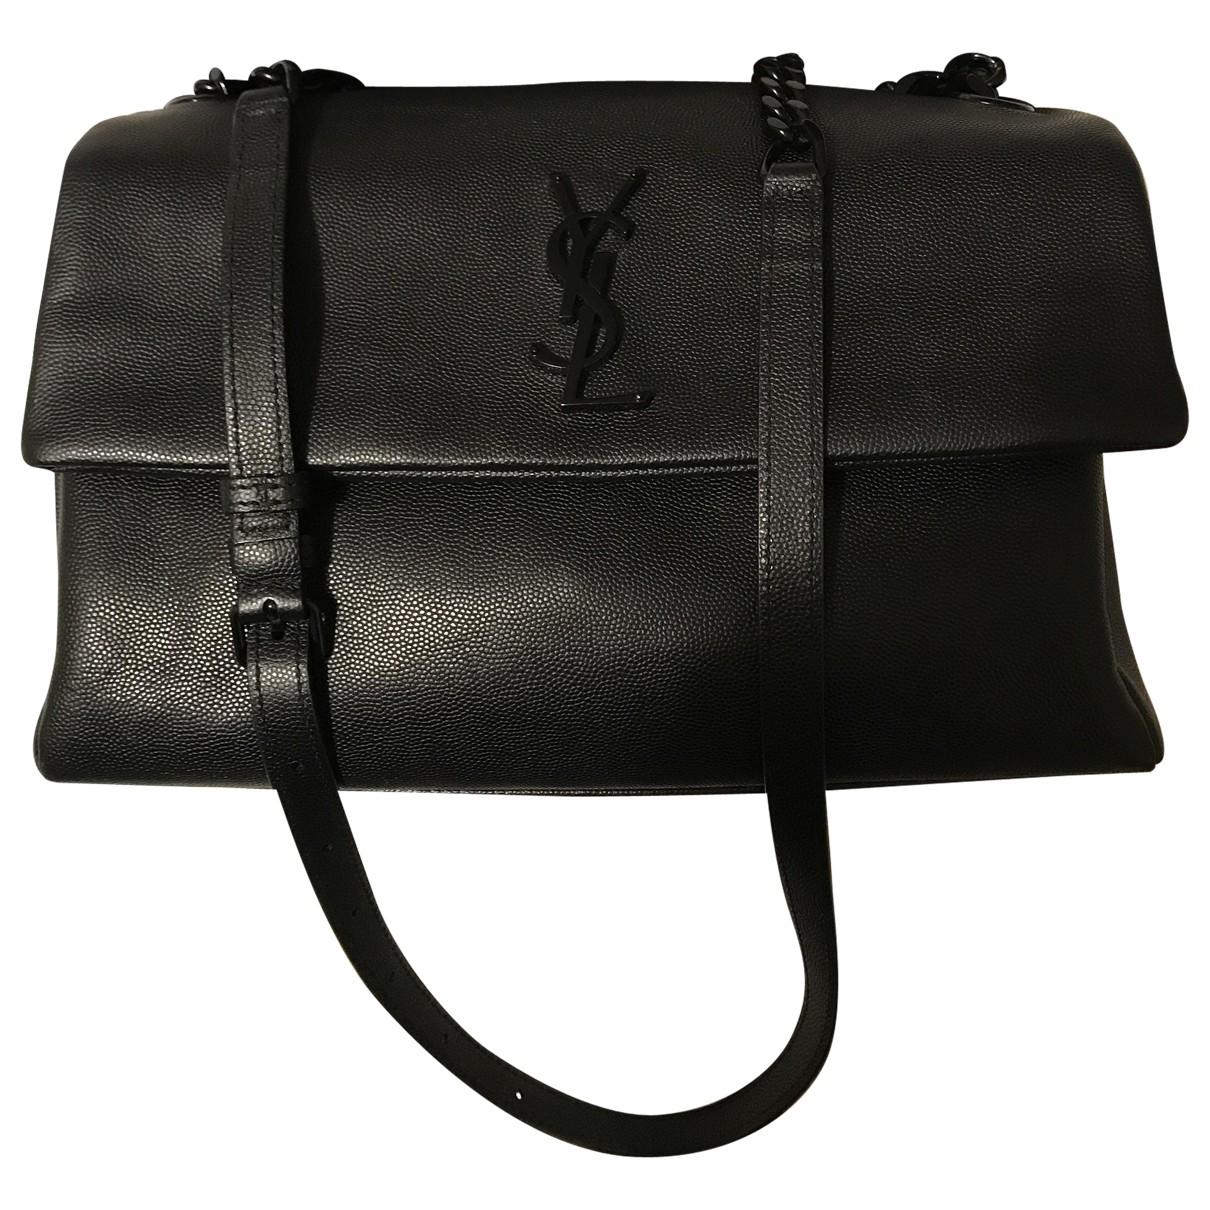 Saint Laurent West Hollywood Black Leather handbag for Women \N